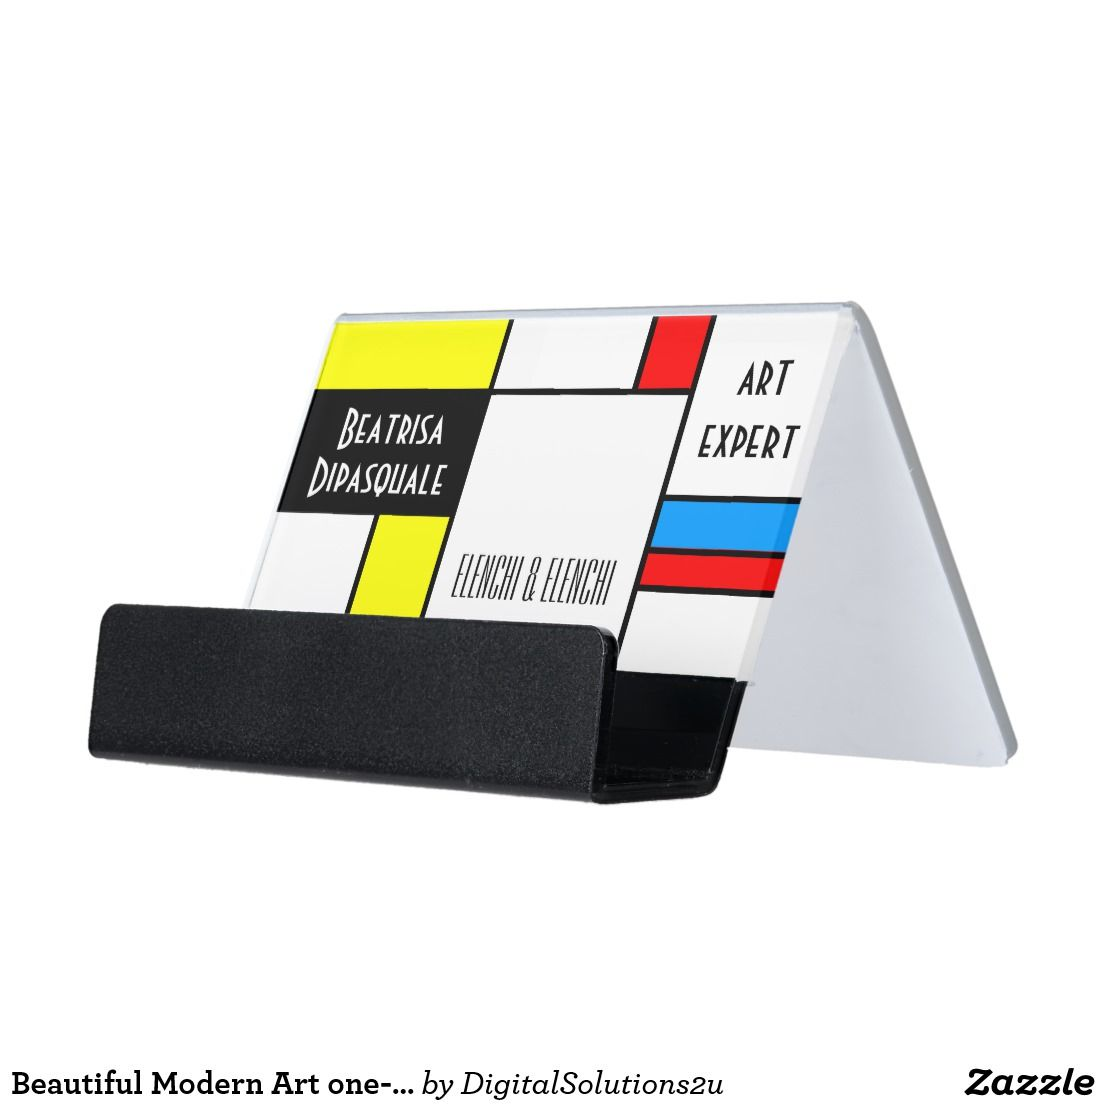 Beautiful Modern Art one-of-a-kind customizable Desk Business Card ...